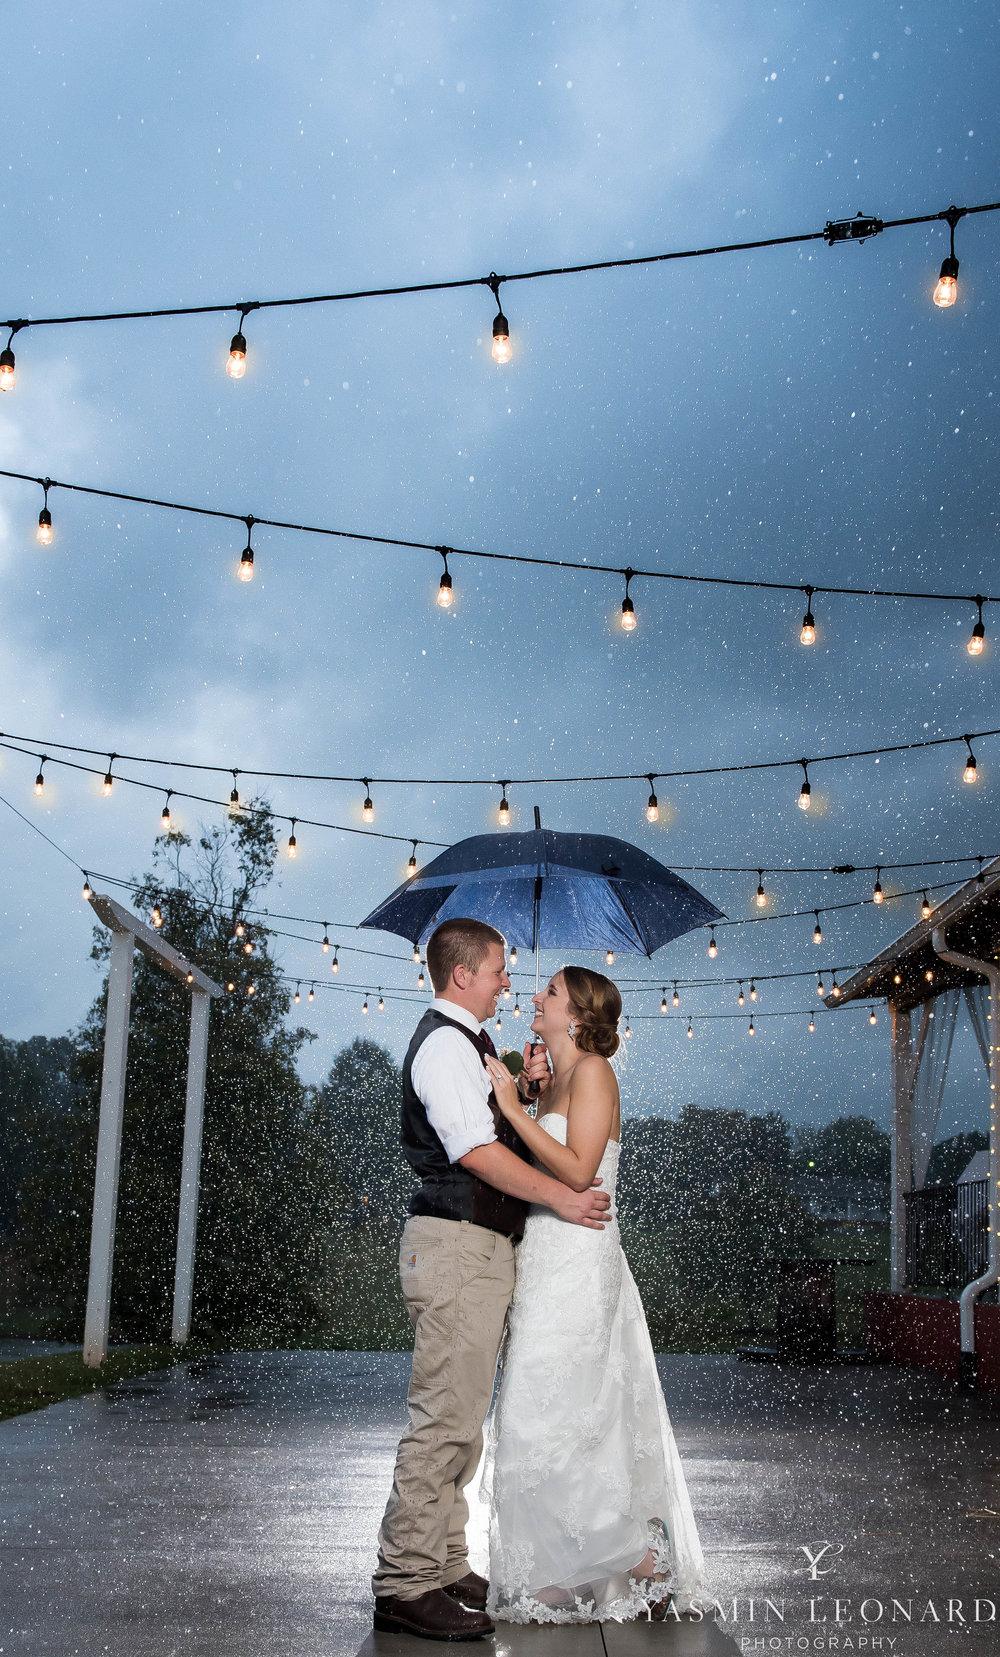 Millikan Farms - NC Wedding Venue - NC Wedding Photographer - Yasmin Leonard Photography - Rain on your wedding day-76.jpg